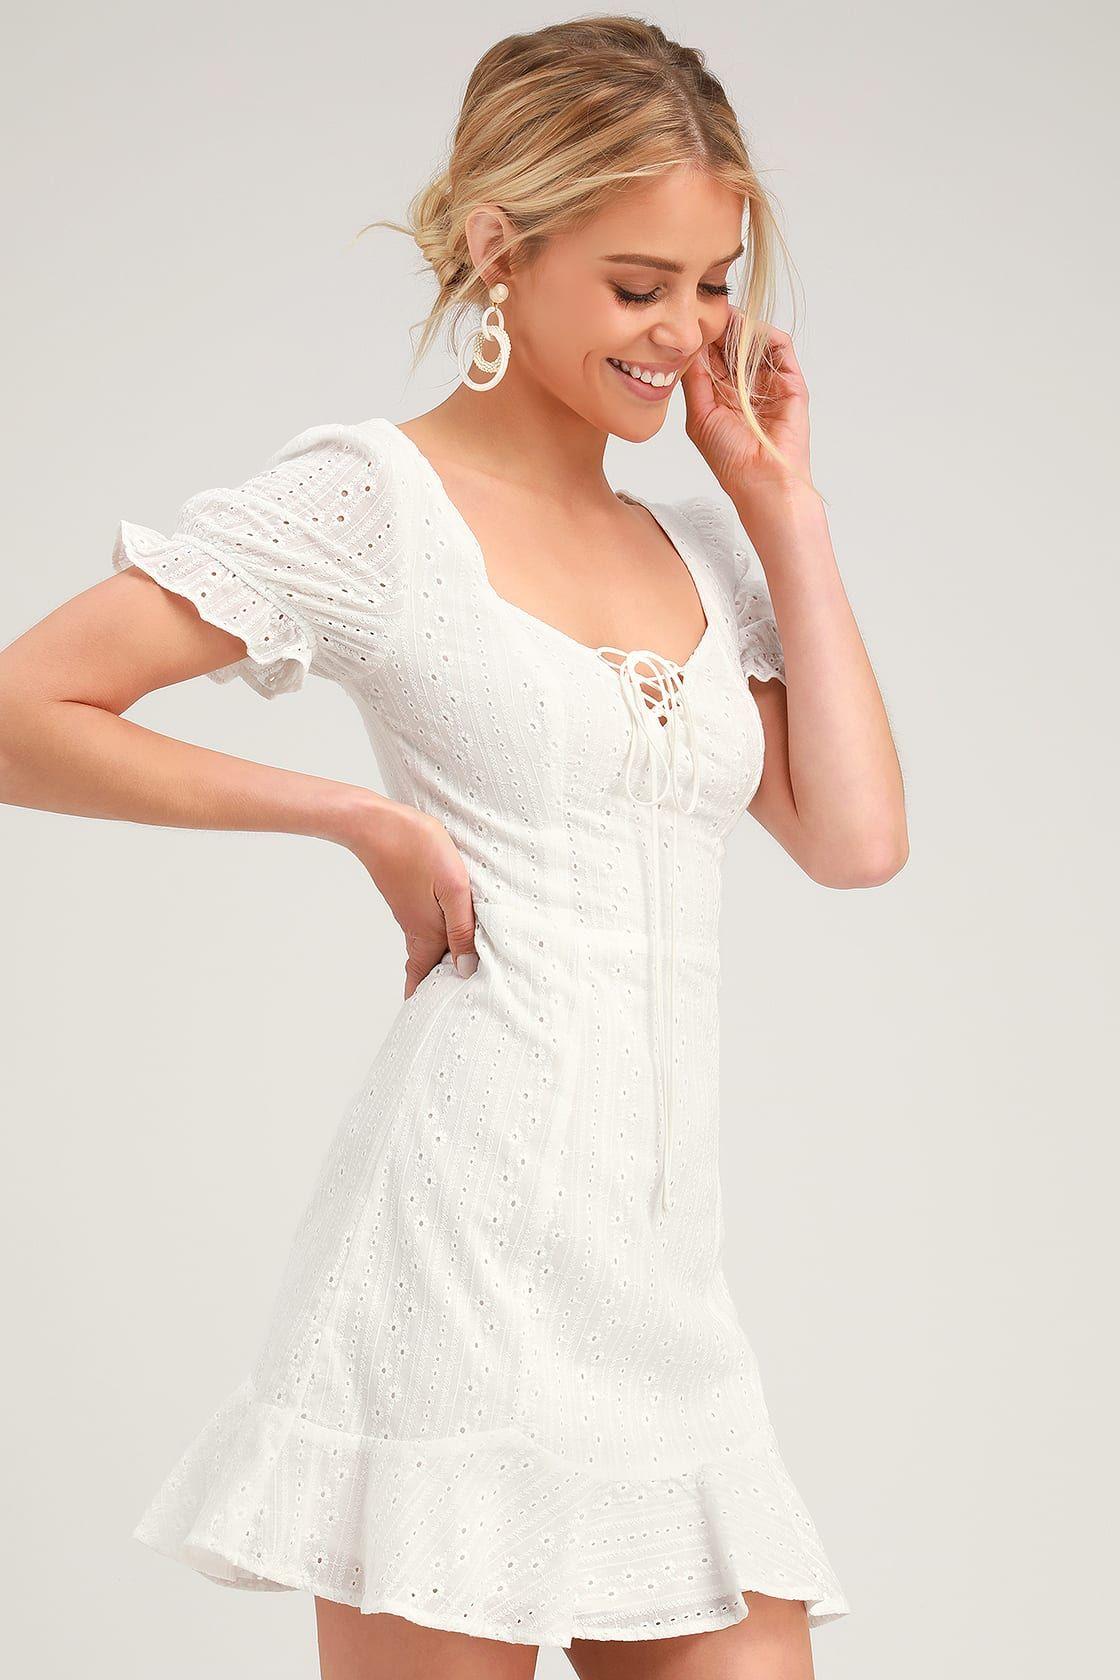 Rapunzel White Eyelet Lace Mini Dress Dresses Lace Mini Dress Eyelet Lace Dress [ 1680 x 1120 Pixel ]